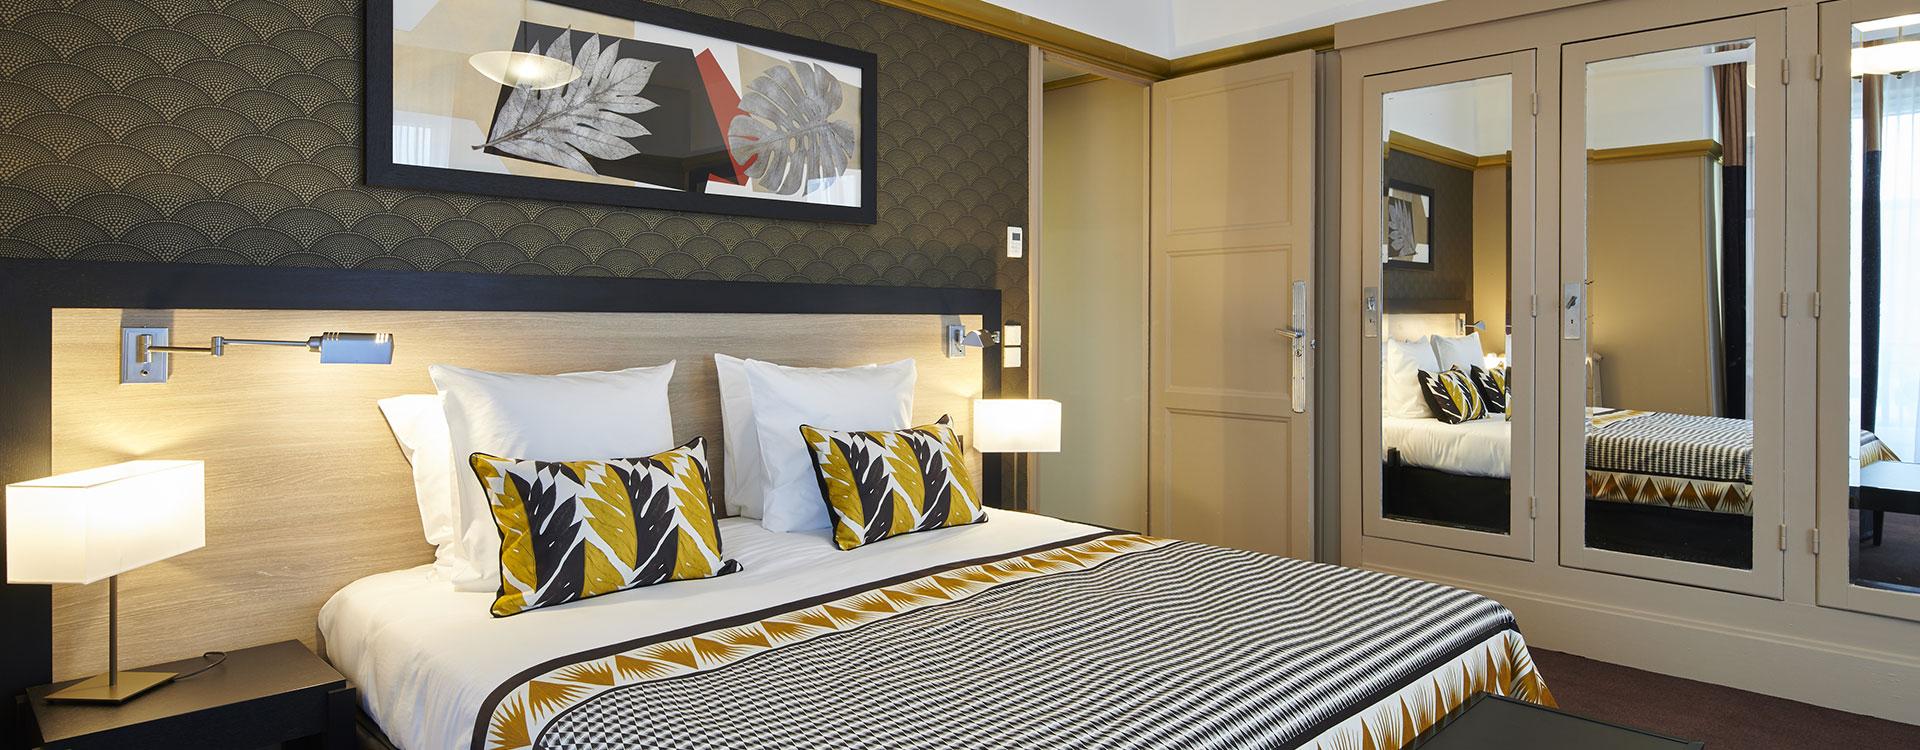 chambre double splendid